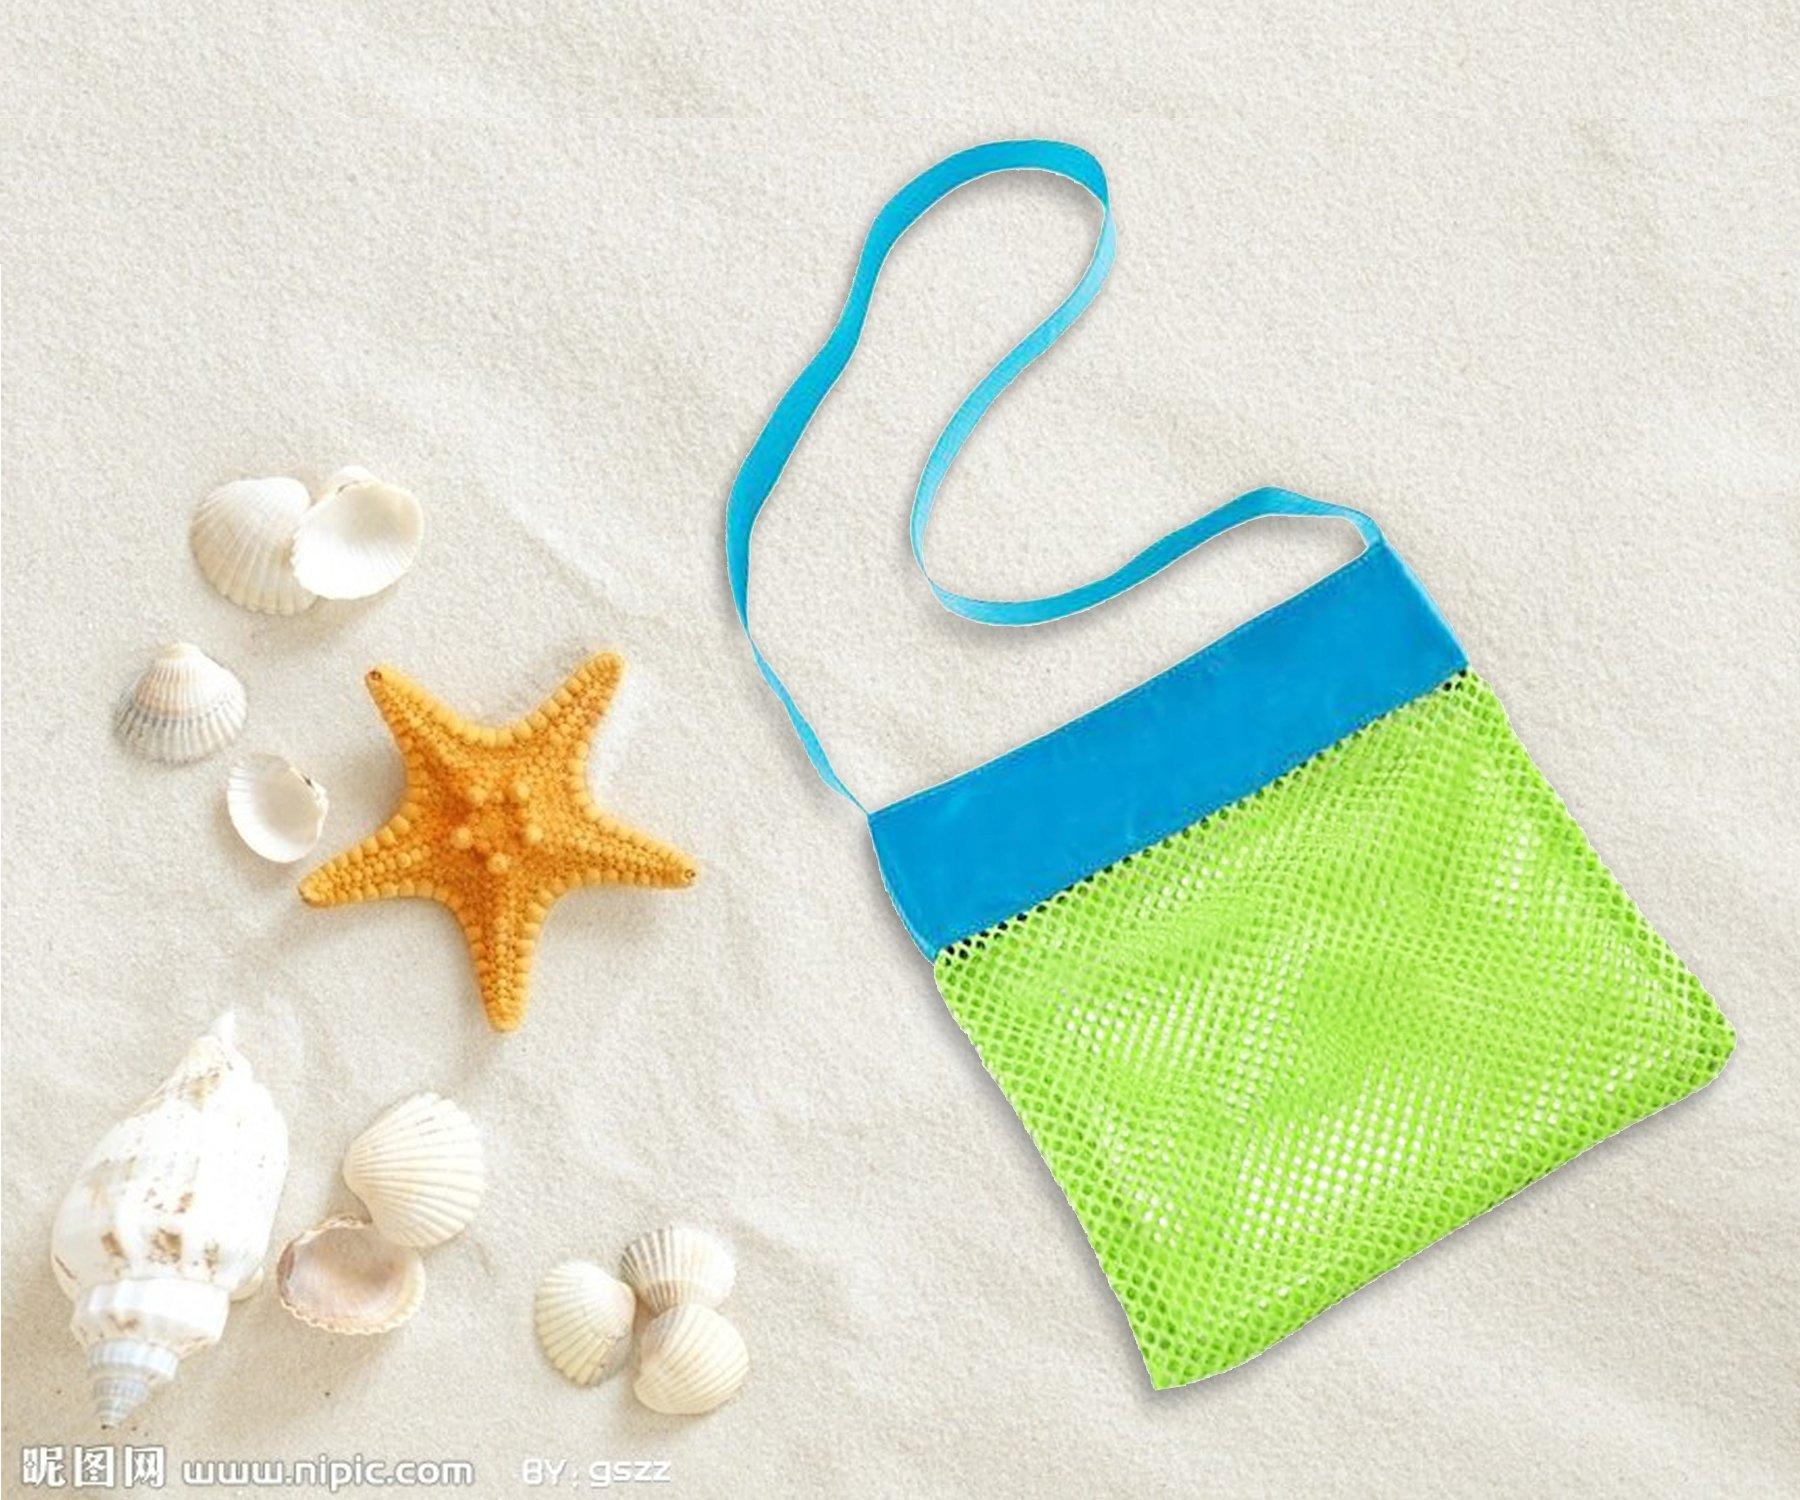 MODARANI Kid's Small Mesh Beach Bag Water Toy Tote Bag Crossbody Travel Bag for Boys Girls by MODARANI (Image #2)